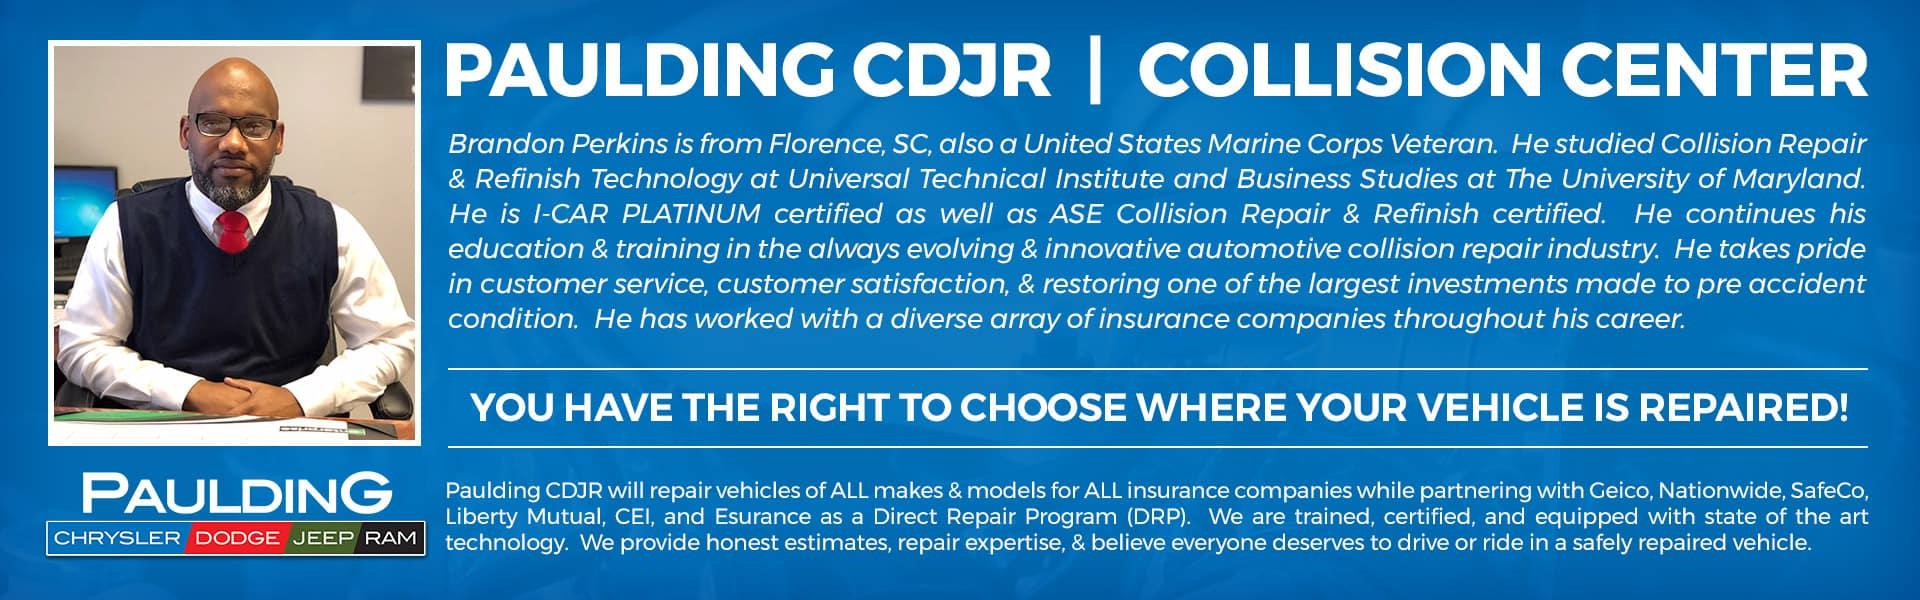 Come Visit The Paulding CDJR Collision Center